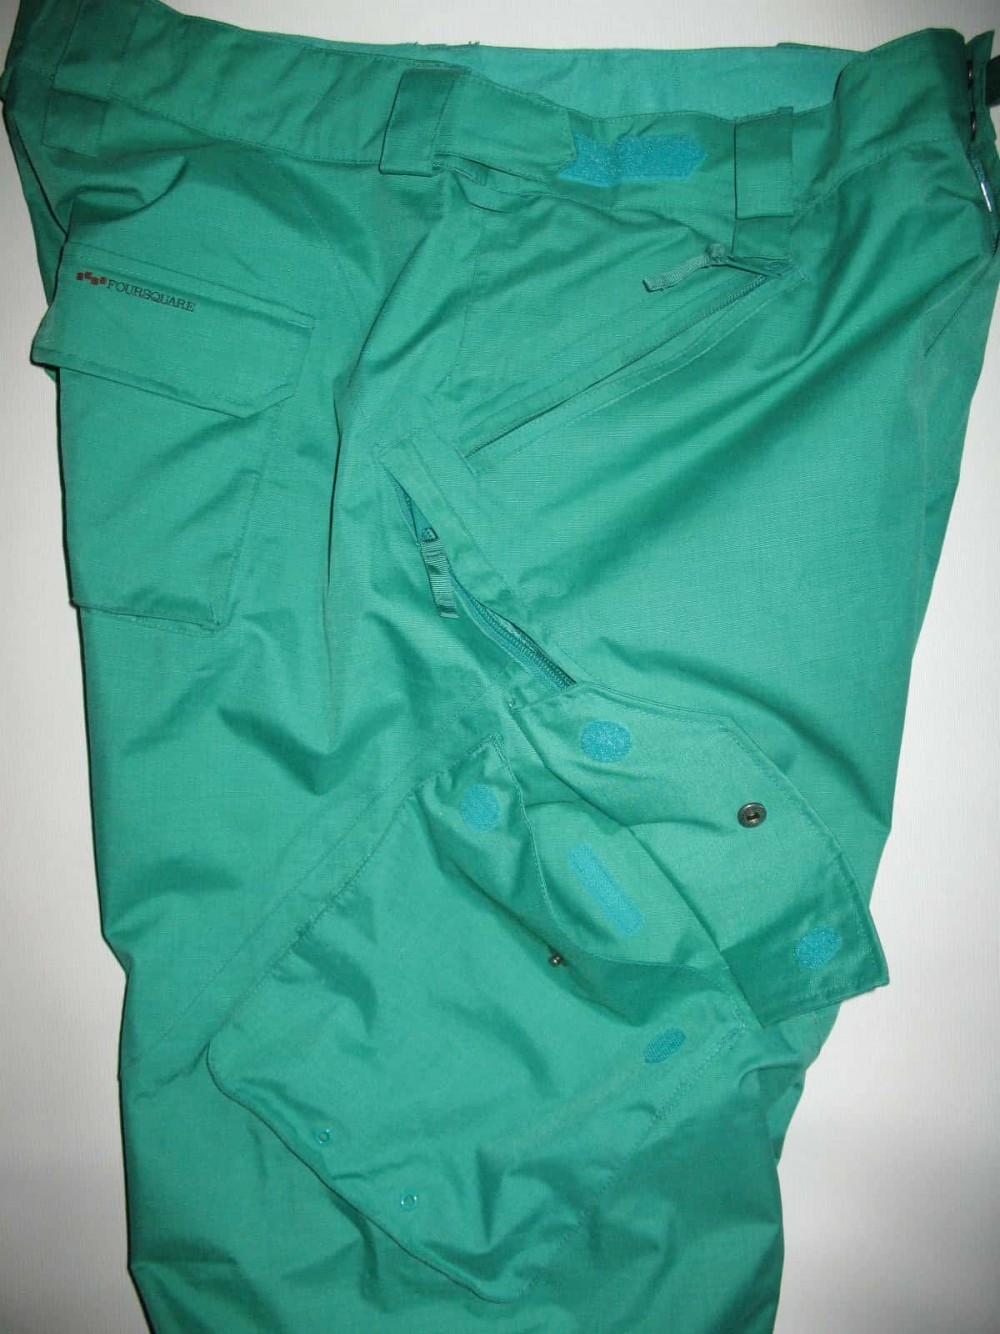 Штаны FOURSQUARE q snowboard pants (размер XL) - 7